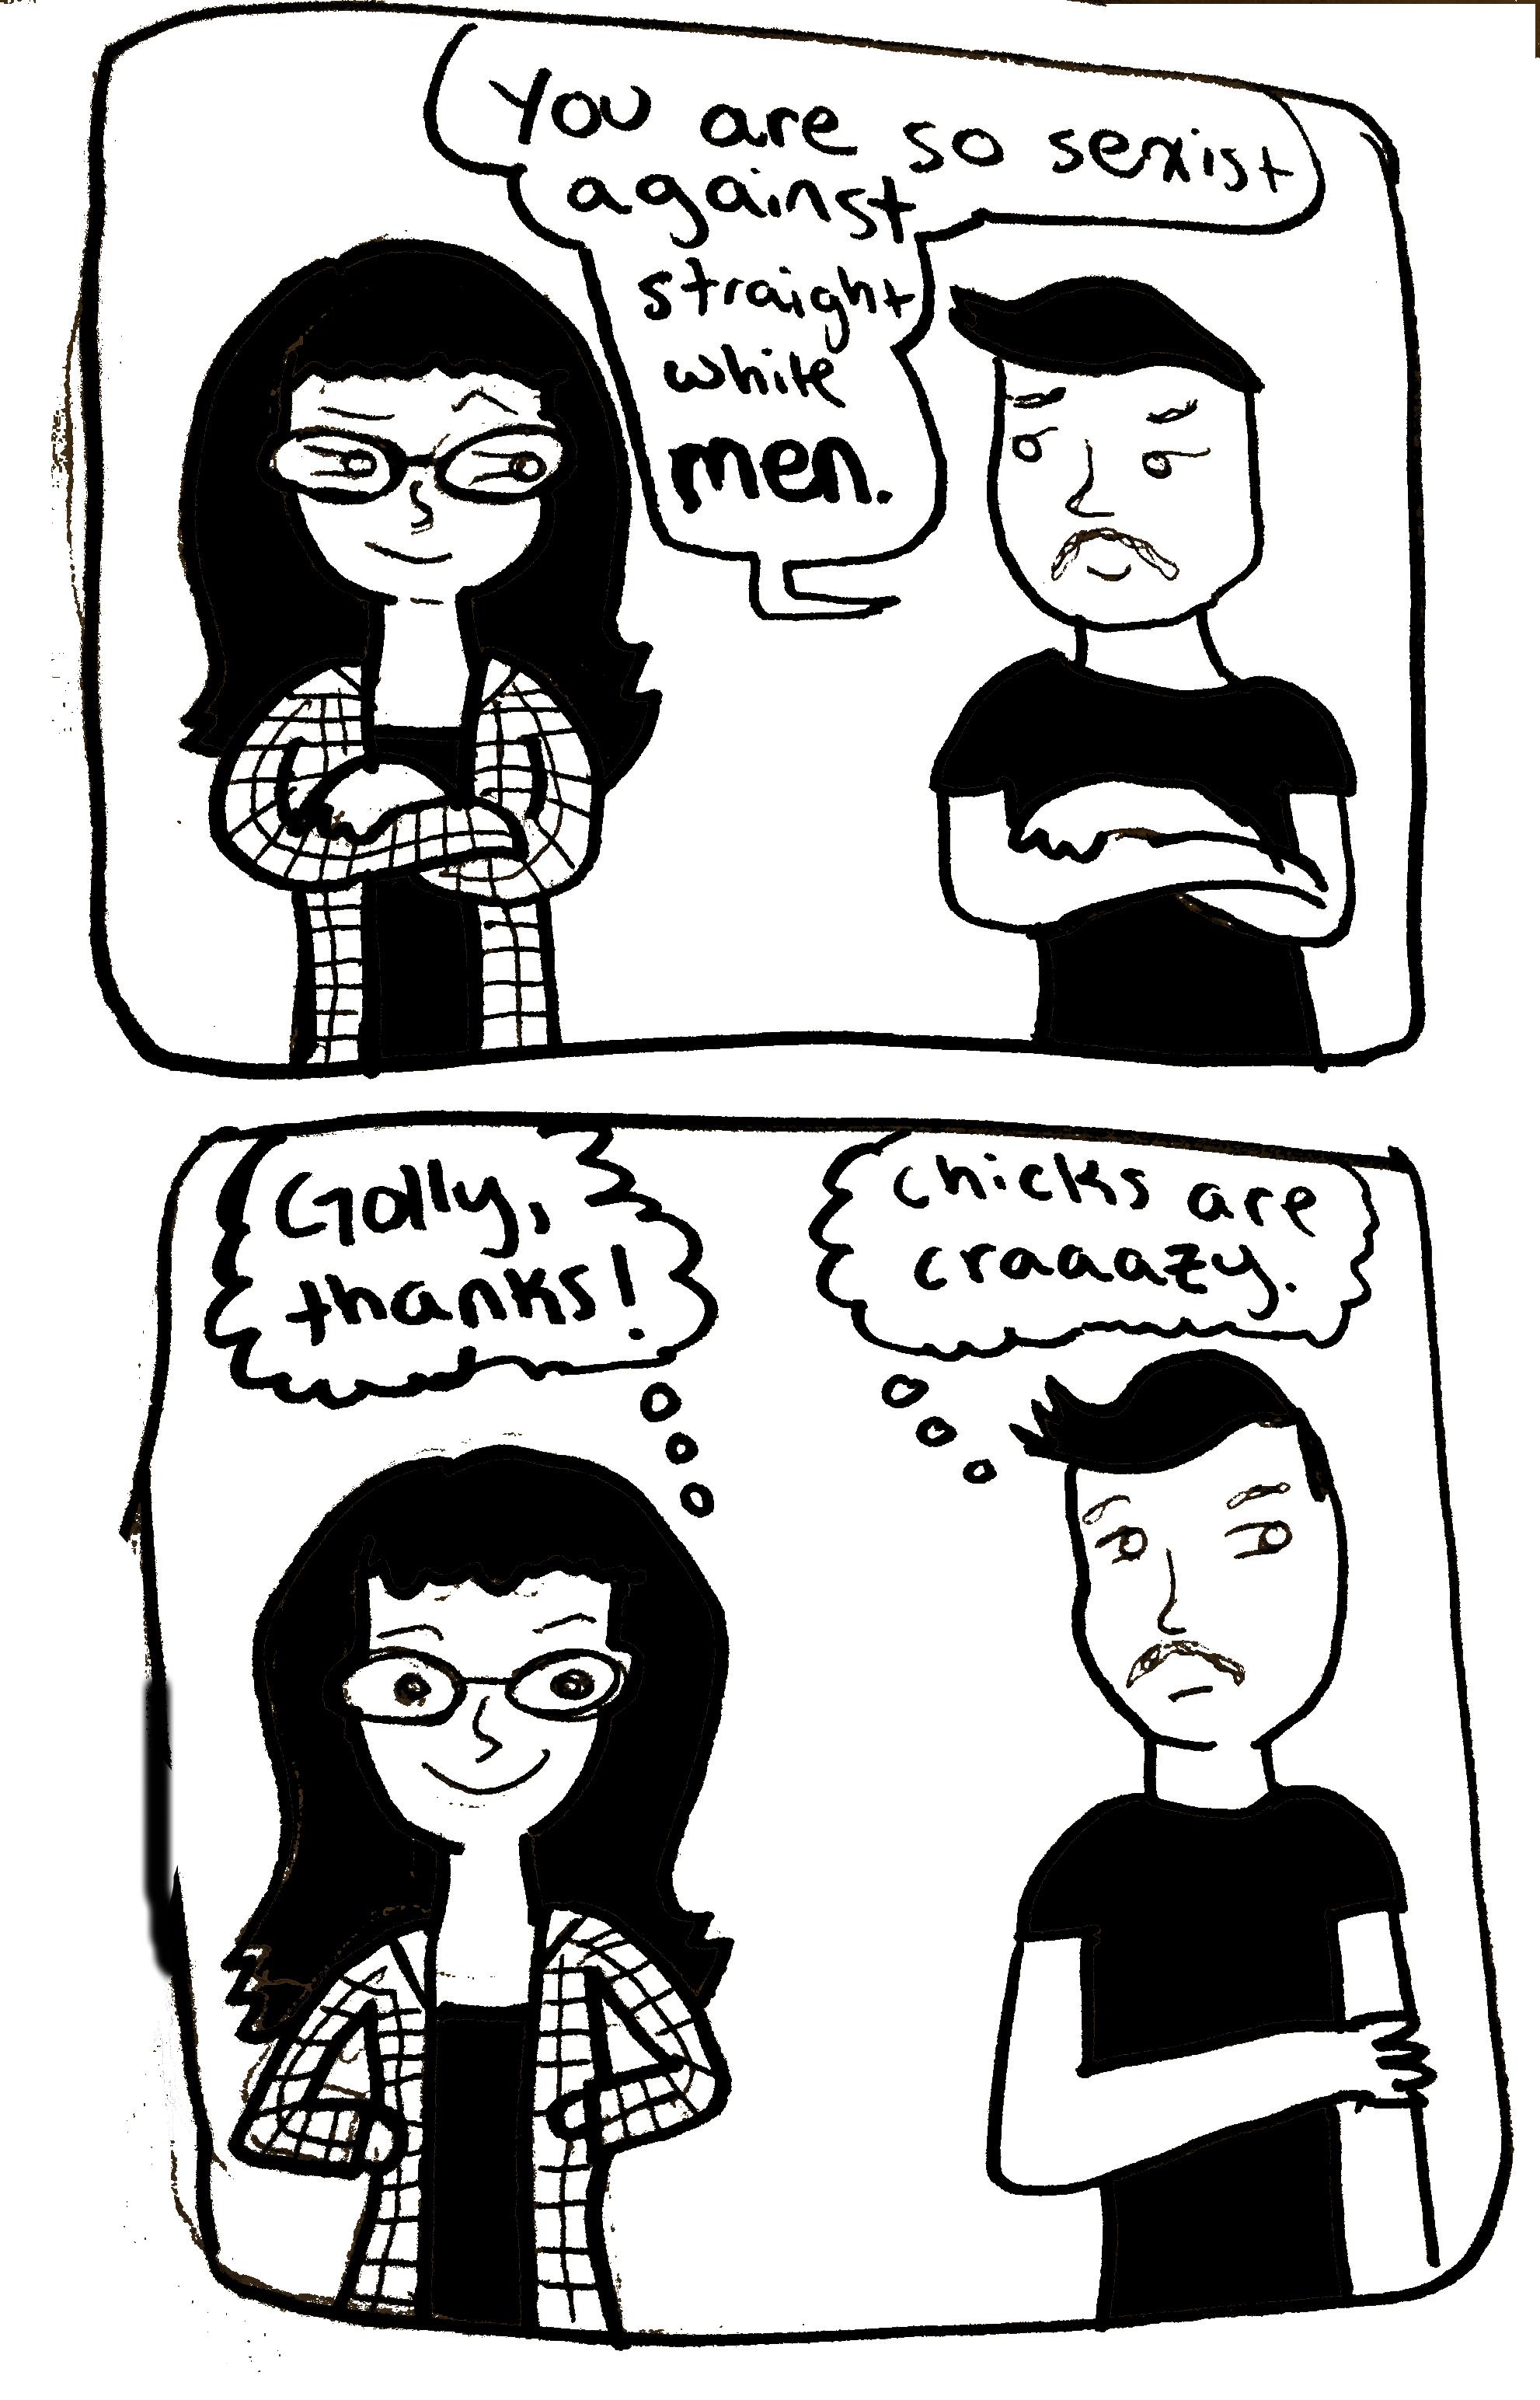 """reverse sexism"""